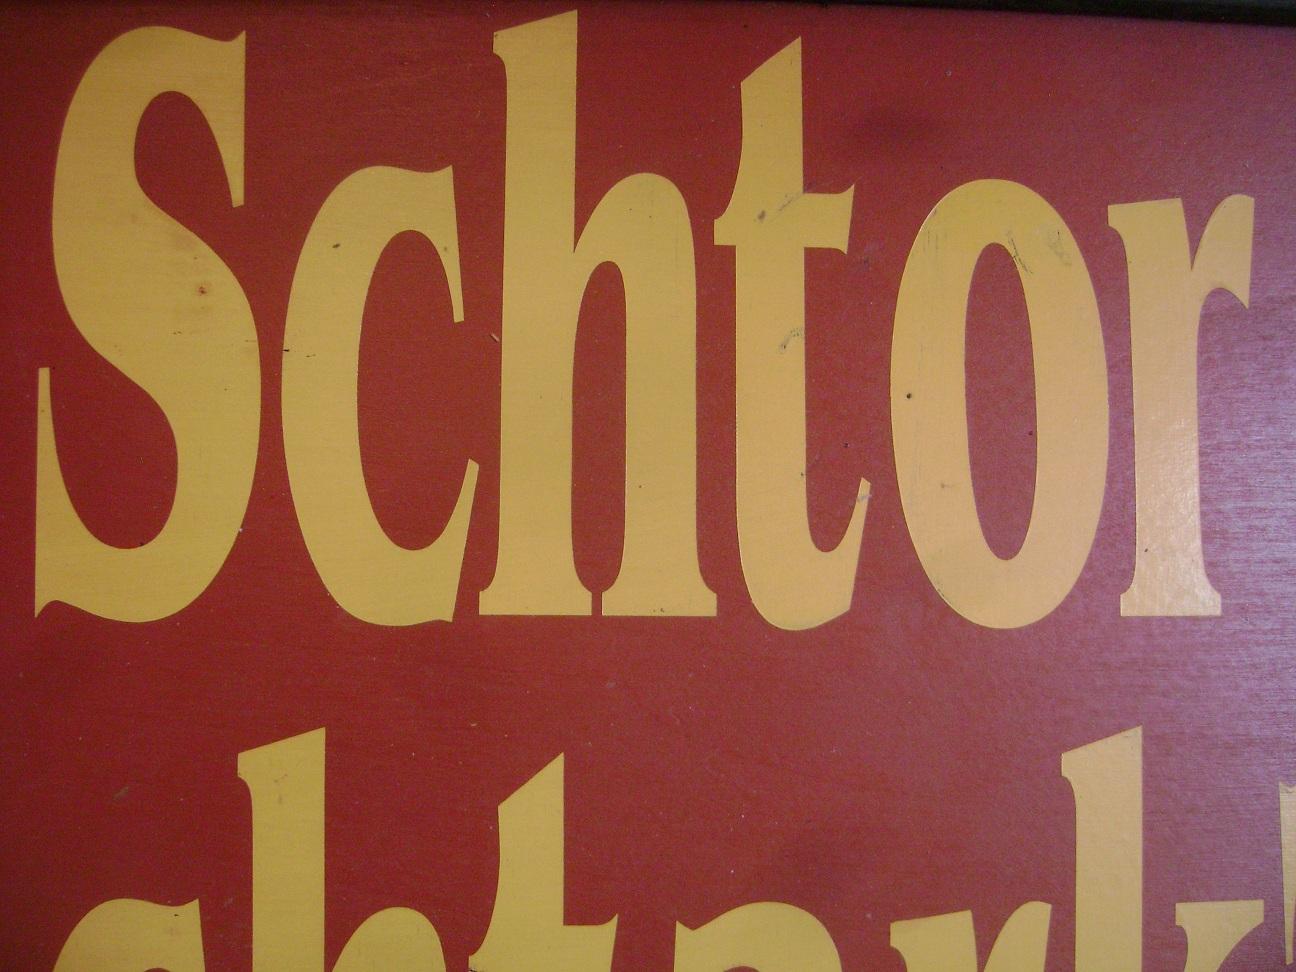 Tabla_Schtor_schtark_3.JPG